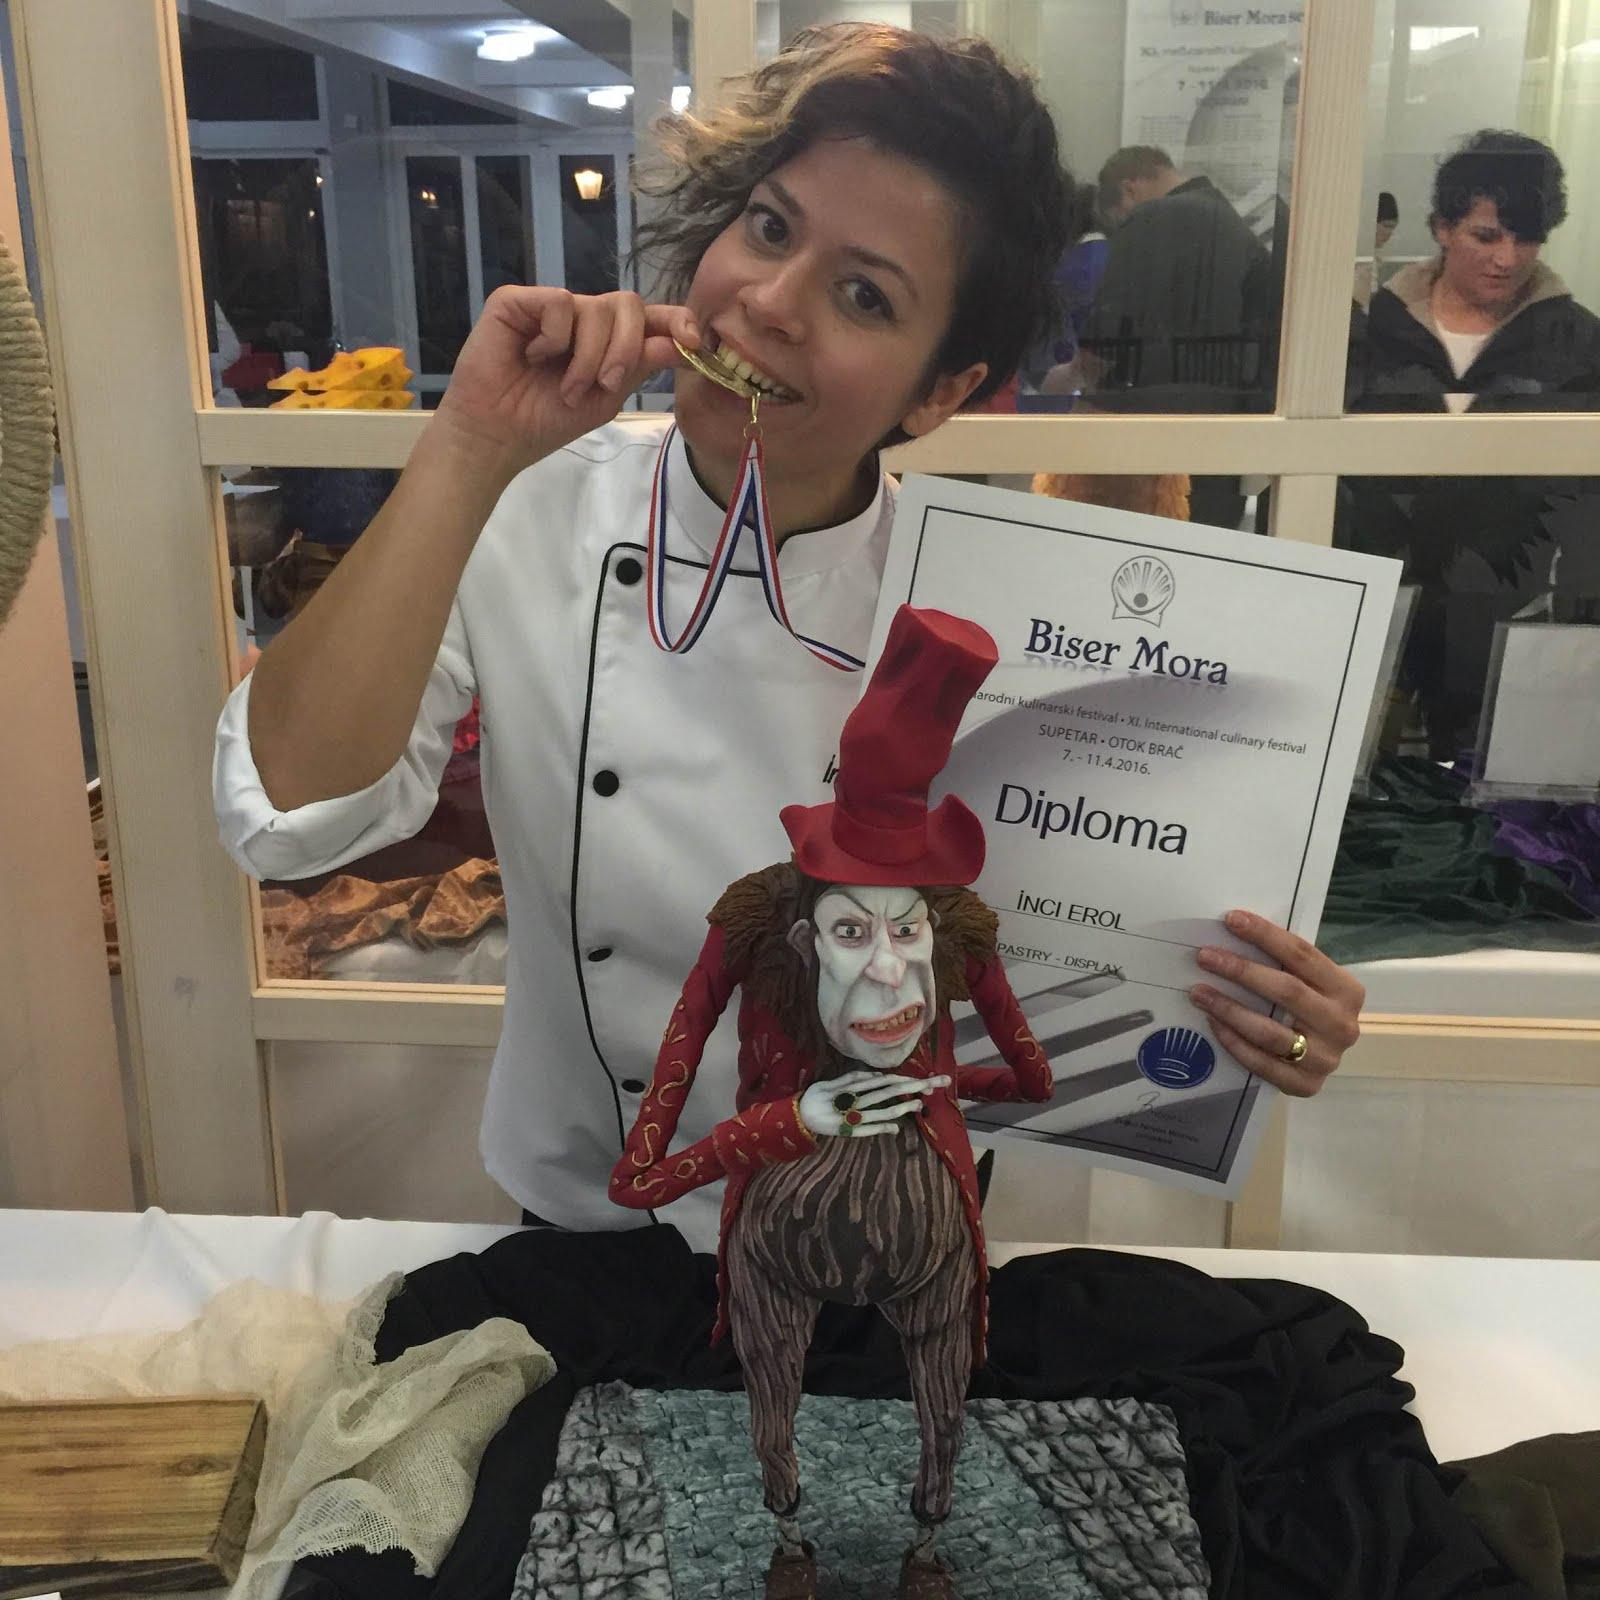 Hırvatistan 11. International Culinary Festival' de ALTIN madalya alan çalışmam: Archibald Snatcher